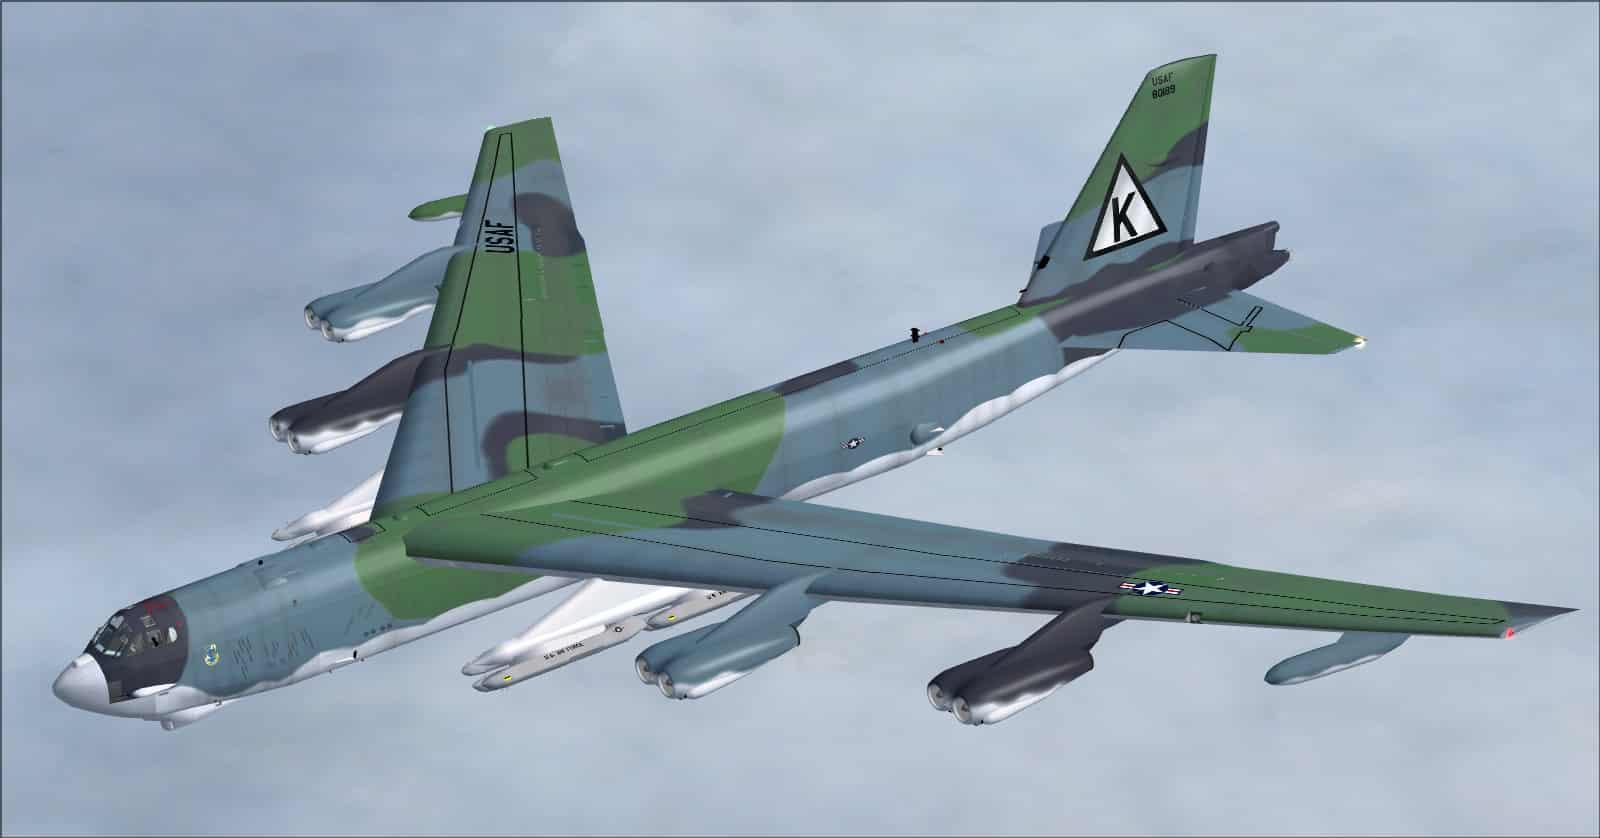 B 52 Bomber Simulator – Wonderful Image Gallery